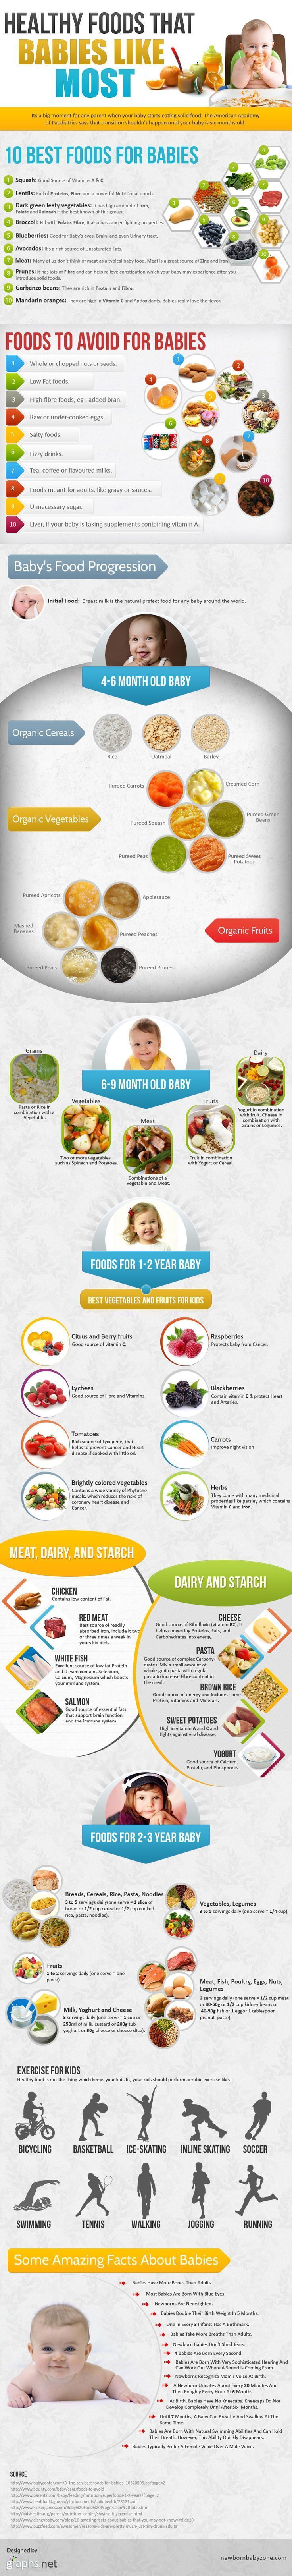 Best foods for babies!